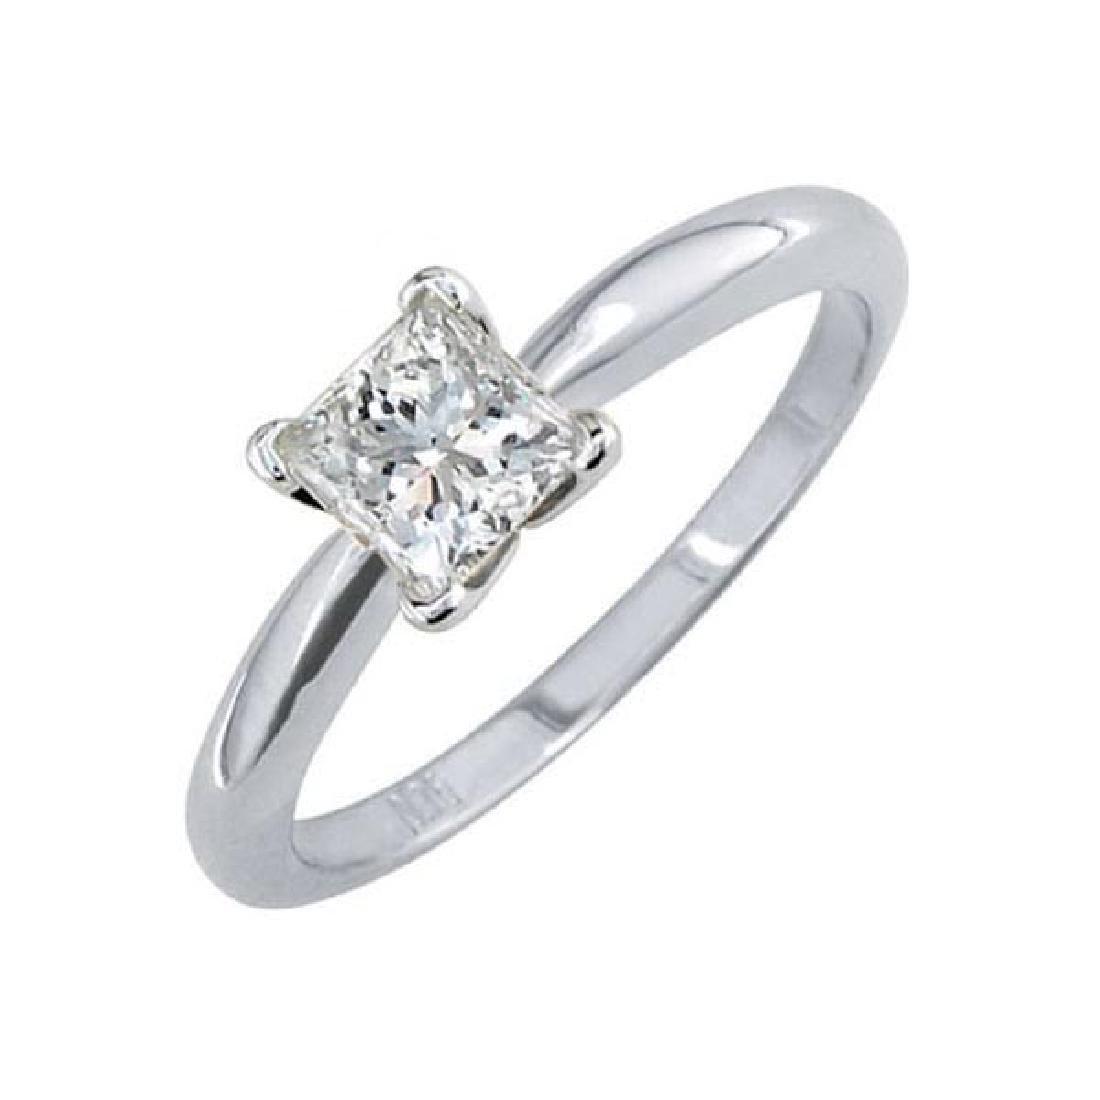 Certified 1.31 CTW Princess Diamond Solitaire 14k Ring